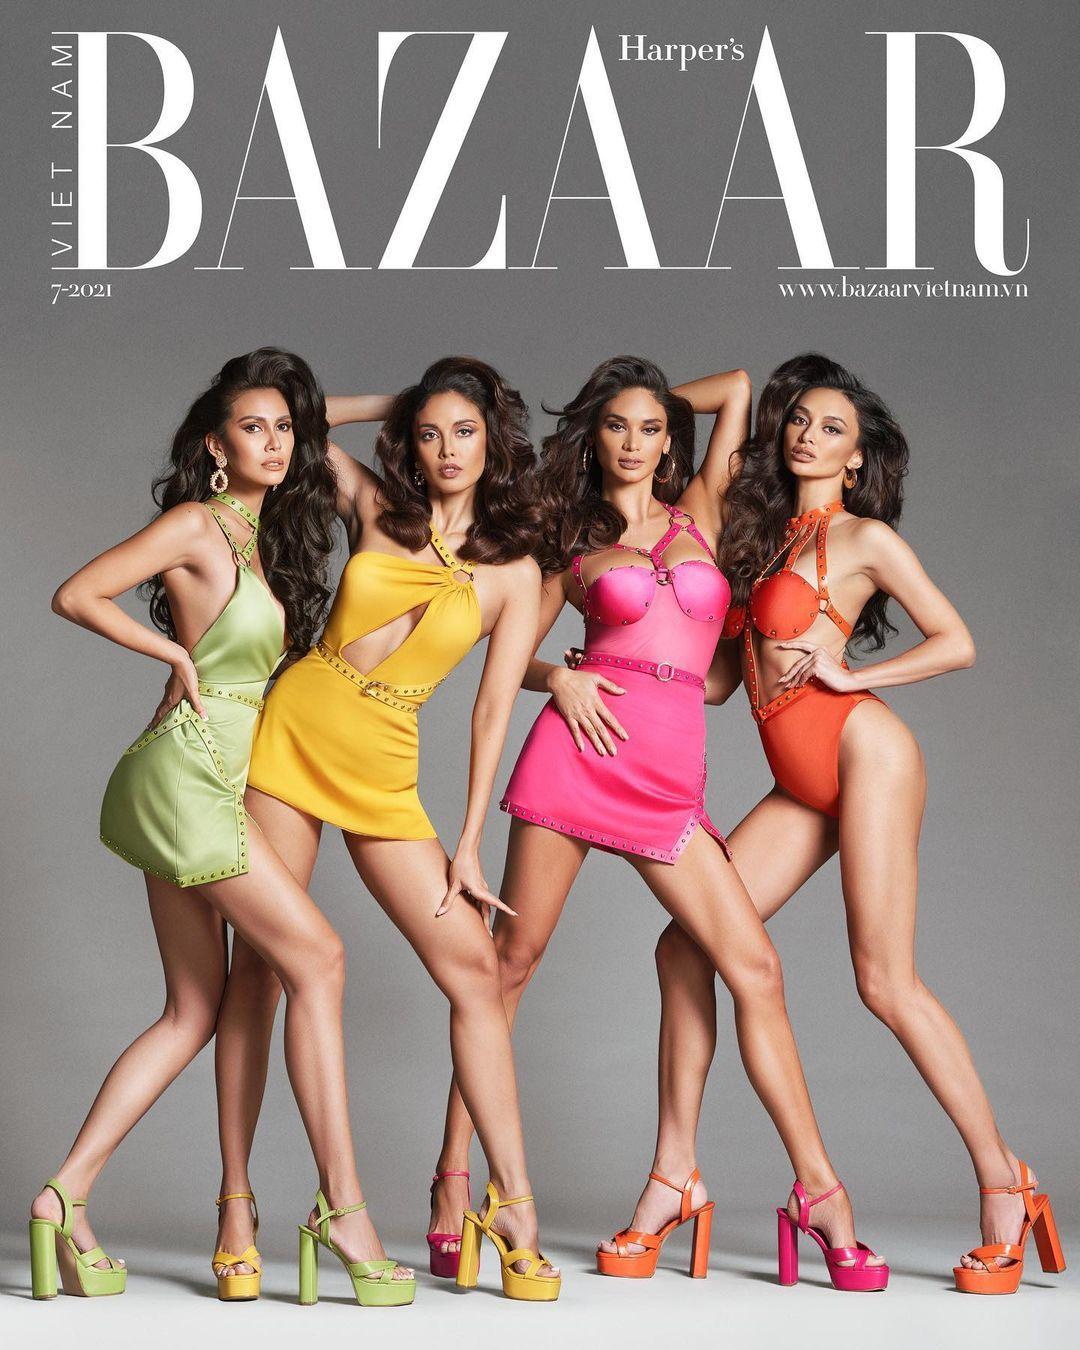 Filipina beauty  Harper's Bazaar Vietnam magazine cover